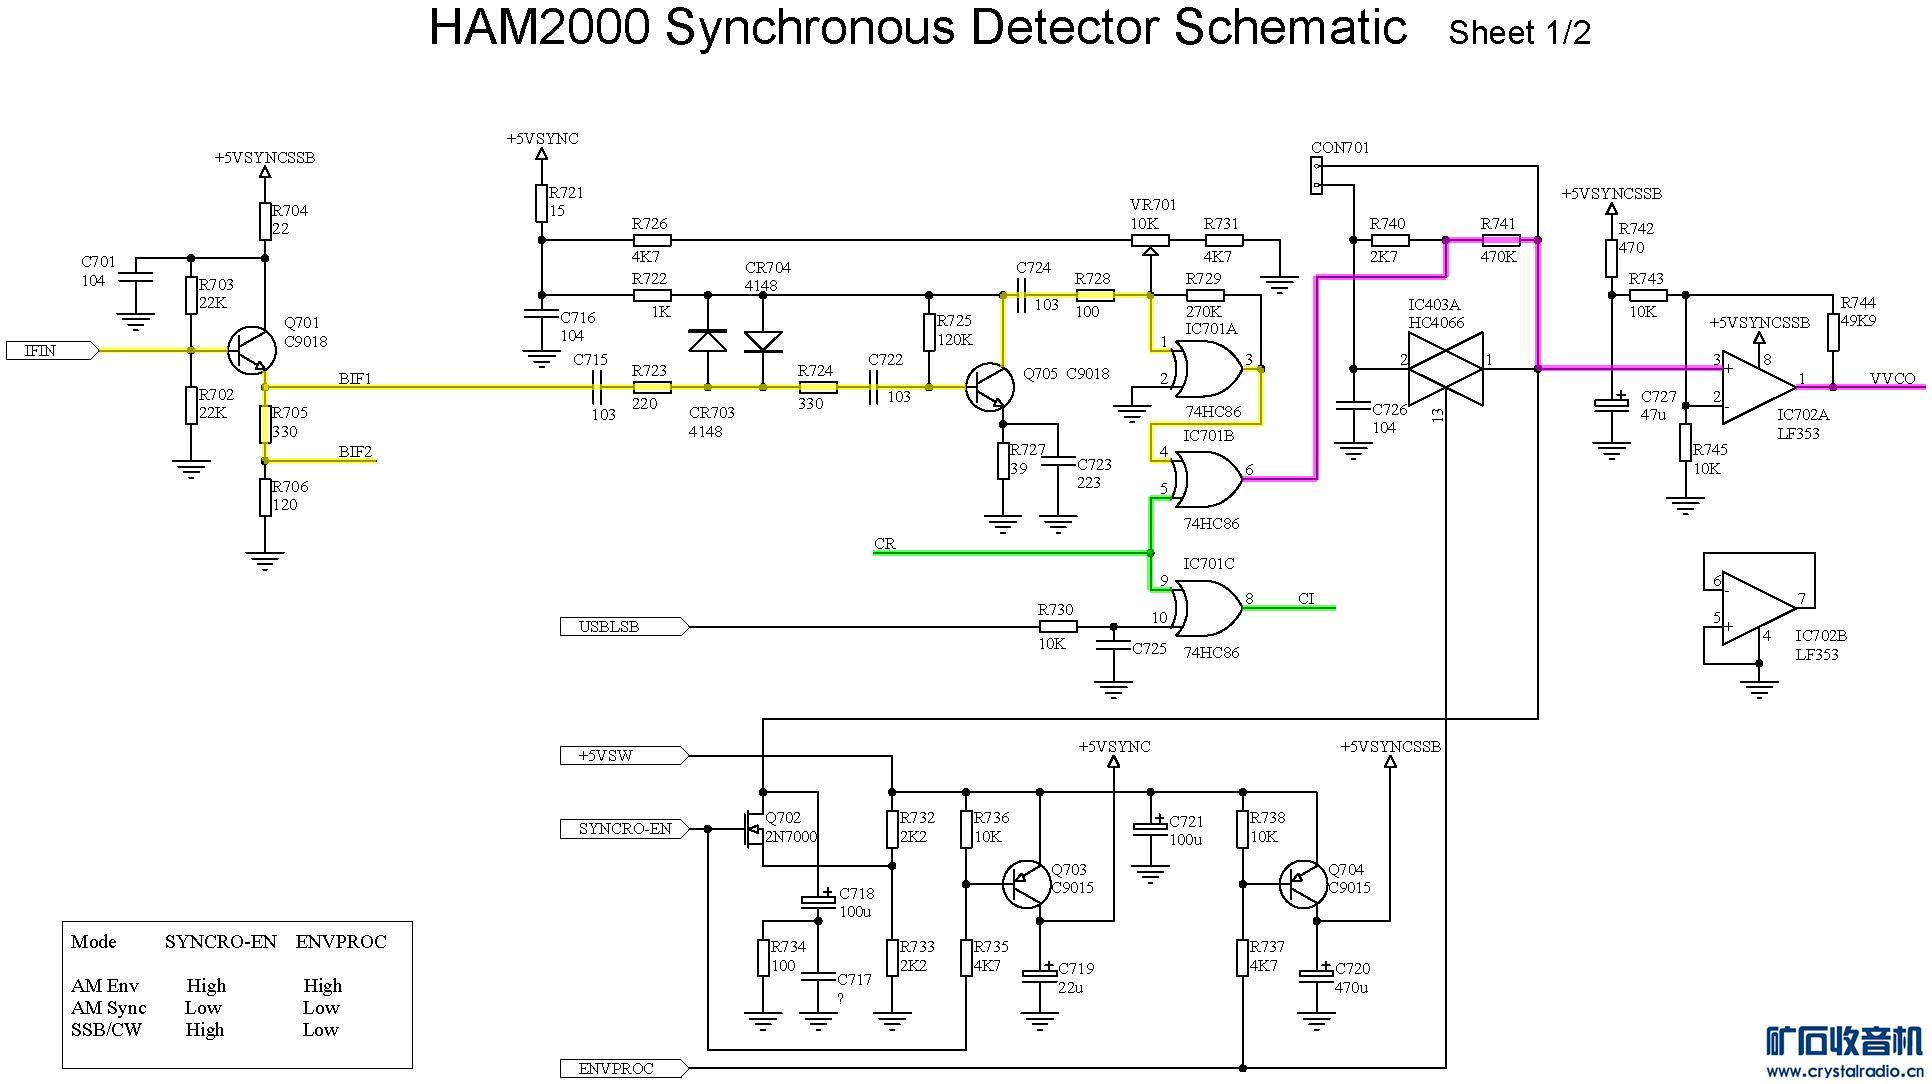 ham2000收音机同步检波电路初步分析,转自矿石论坛ace